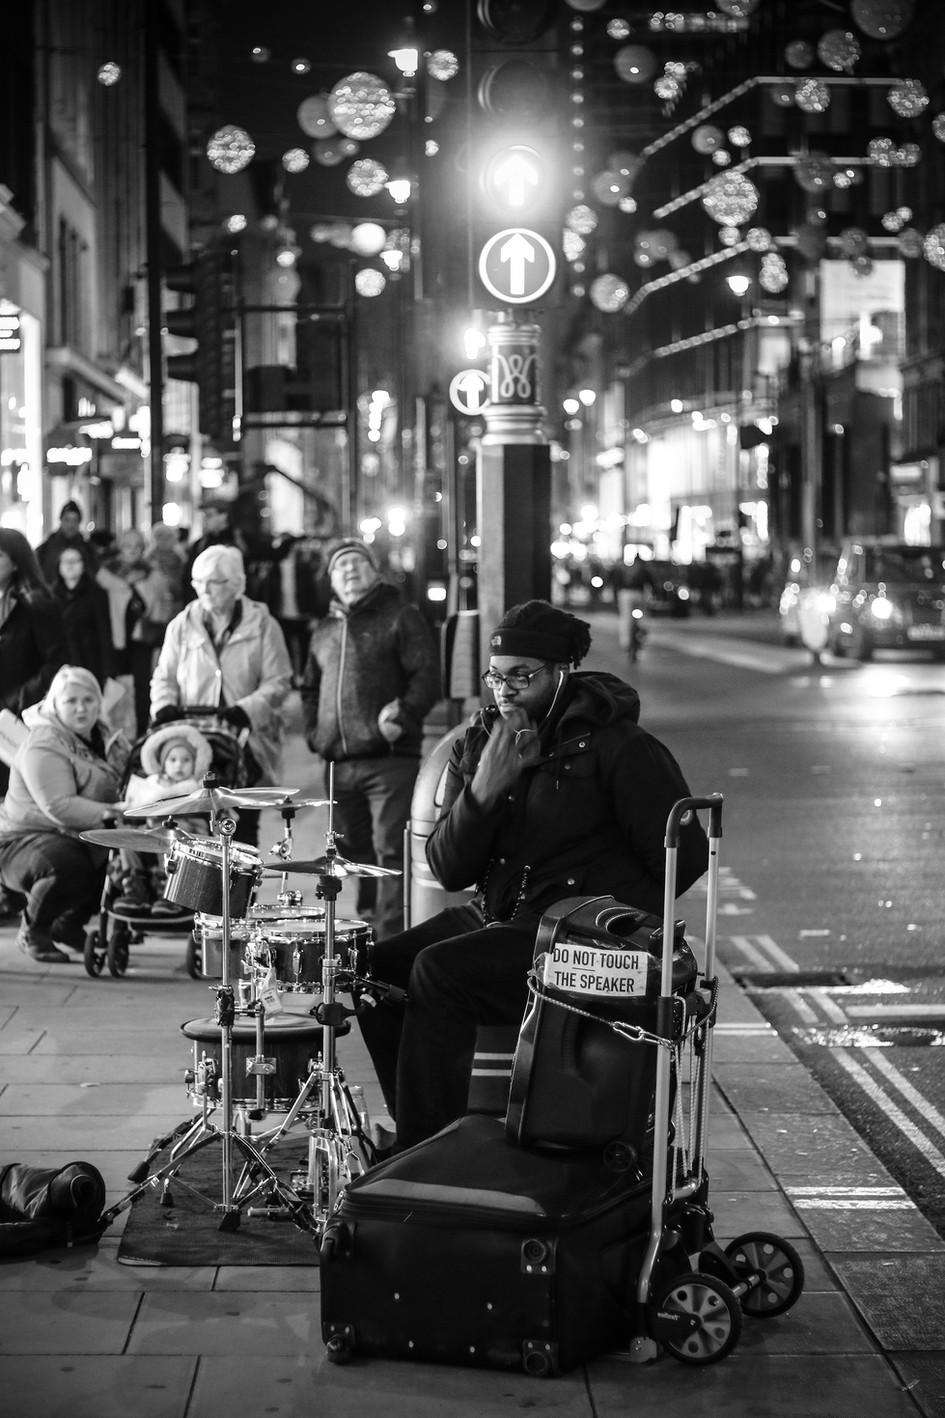 London Street Love